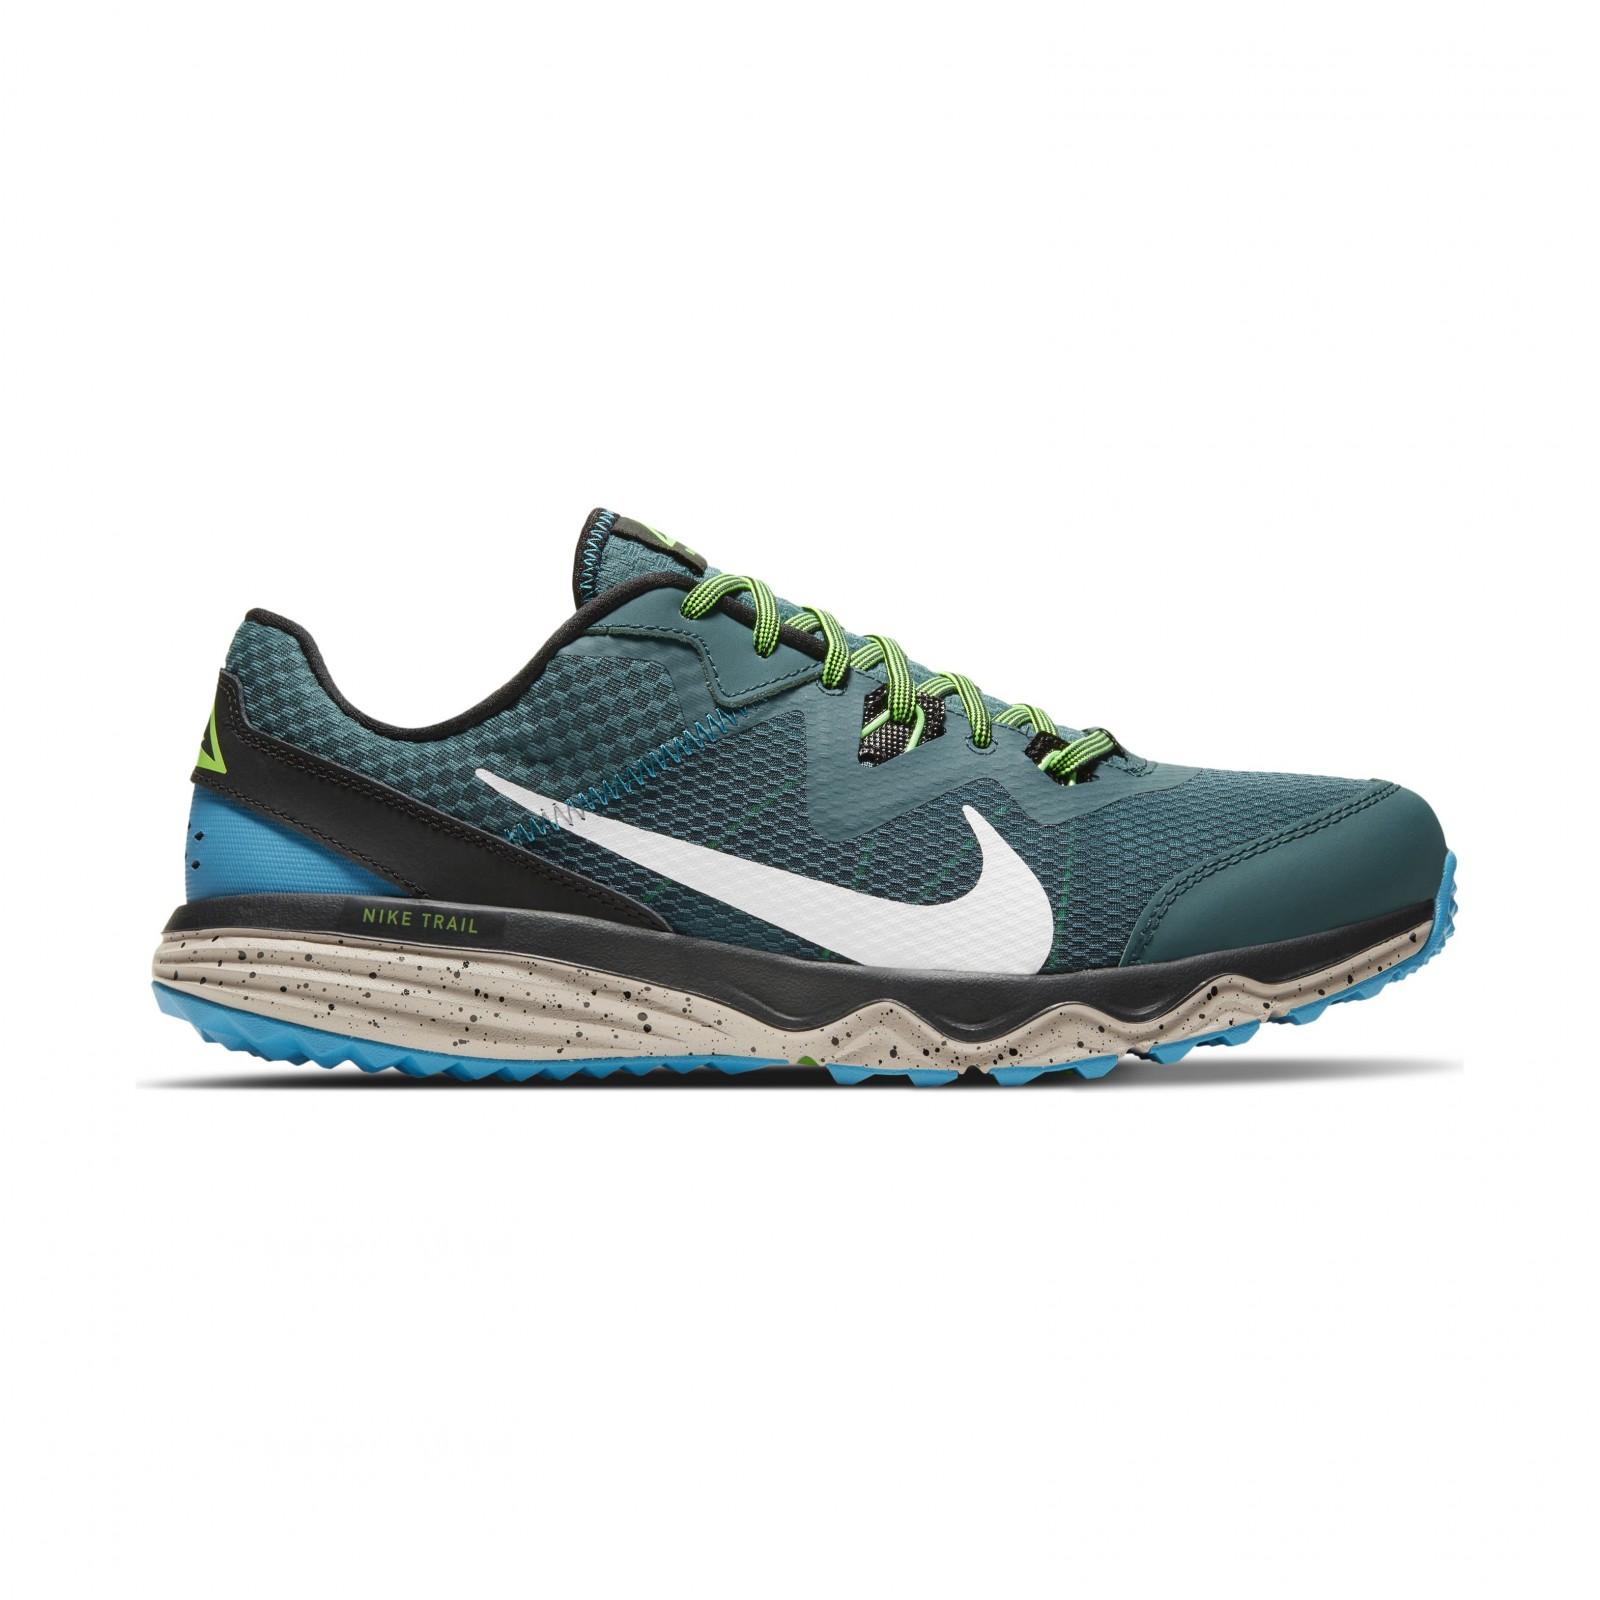 Nike Juniper Trail DARK TEAL GREEN/LIGHT SILVER-BLACK